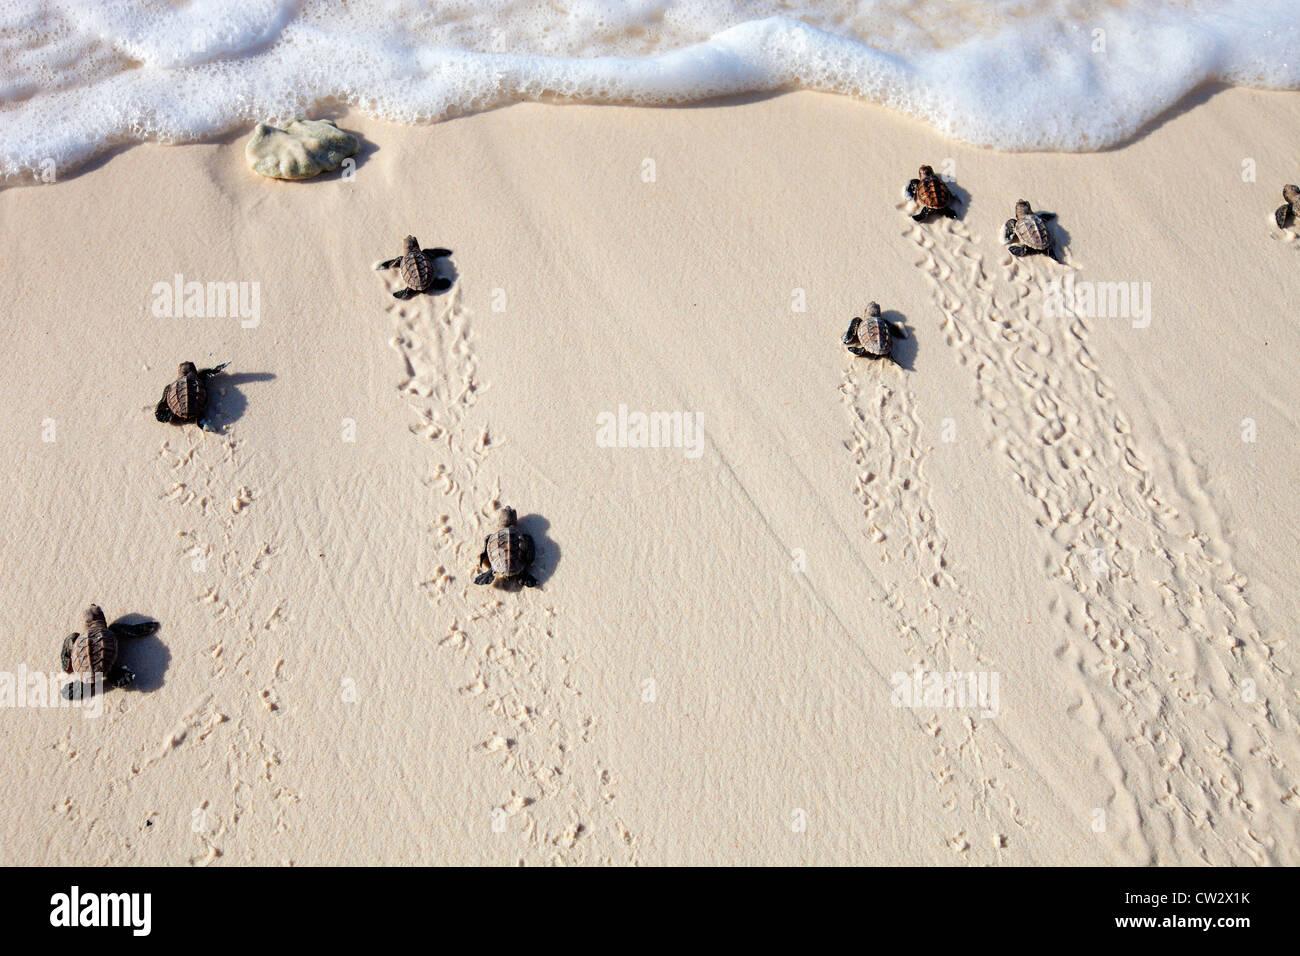 Hawksbill turtle (Eretmochelys imbricata) hatchlings heading into the ocean. Endangered species.Seychelles - Stock Image